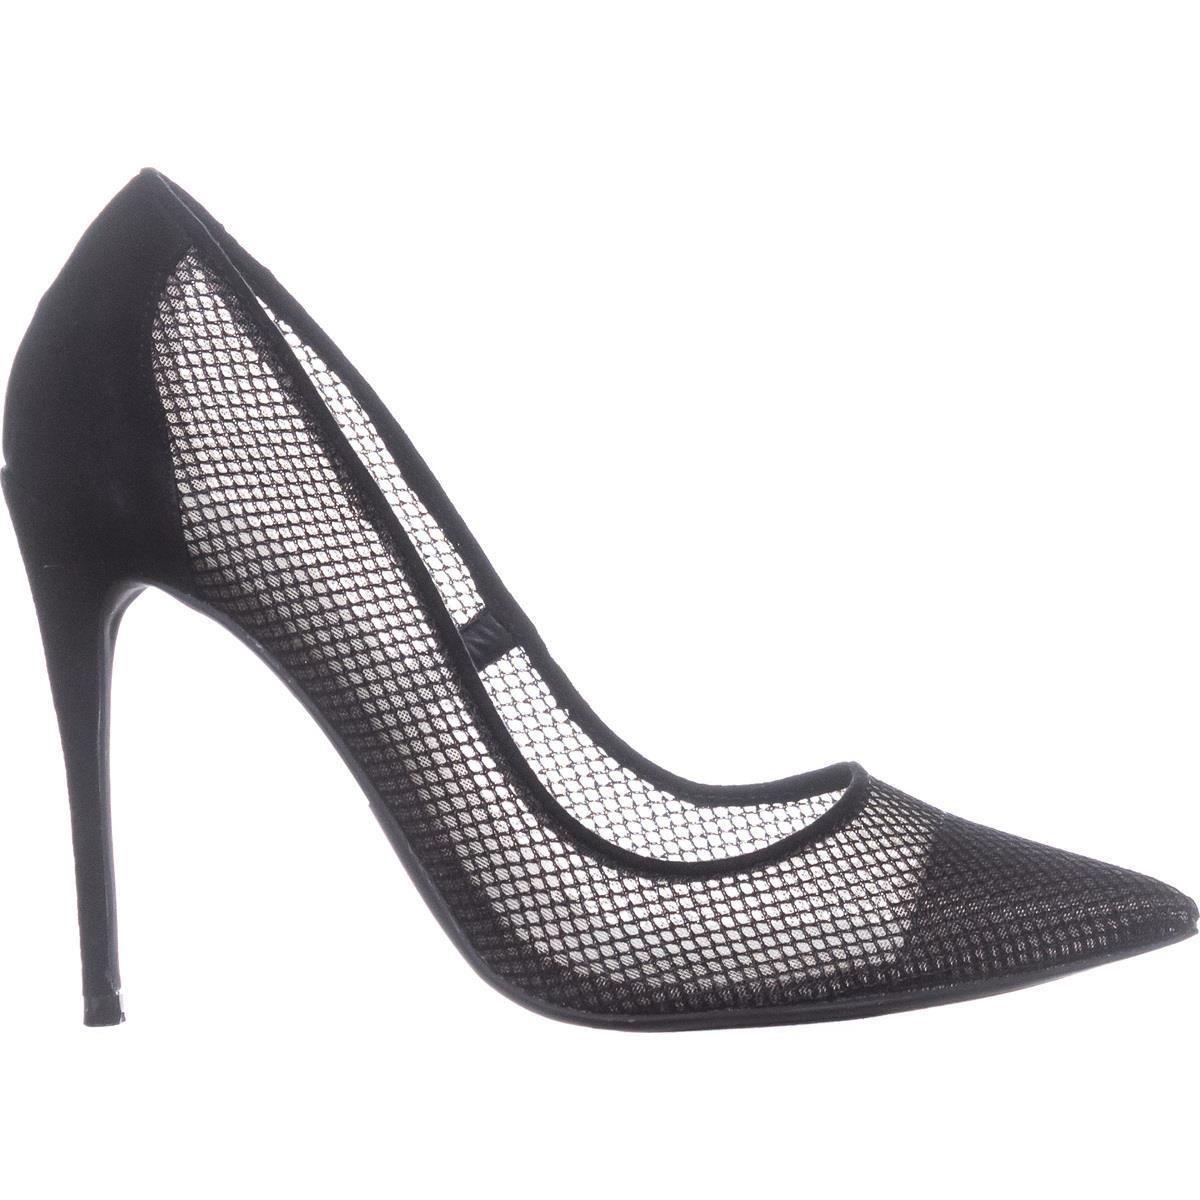 003bcf76ce9b Steve Maddel Darling Pointed Toe Pumps Black 9.5 US  pumps  heels   stevemadden  blackheels  mesh  shoes  stopping  style  trending  fashion   womensfashion